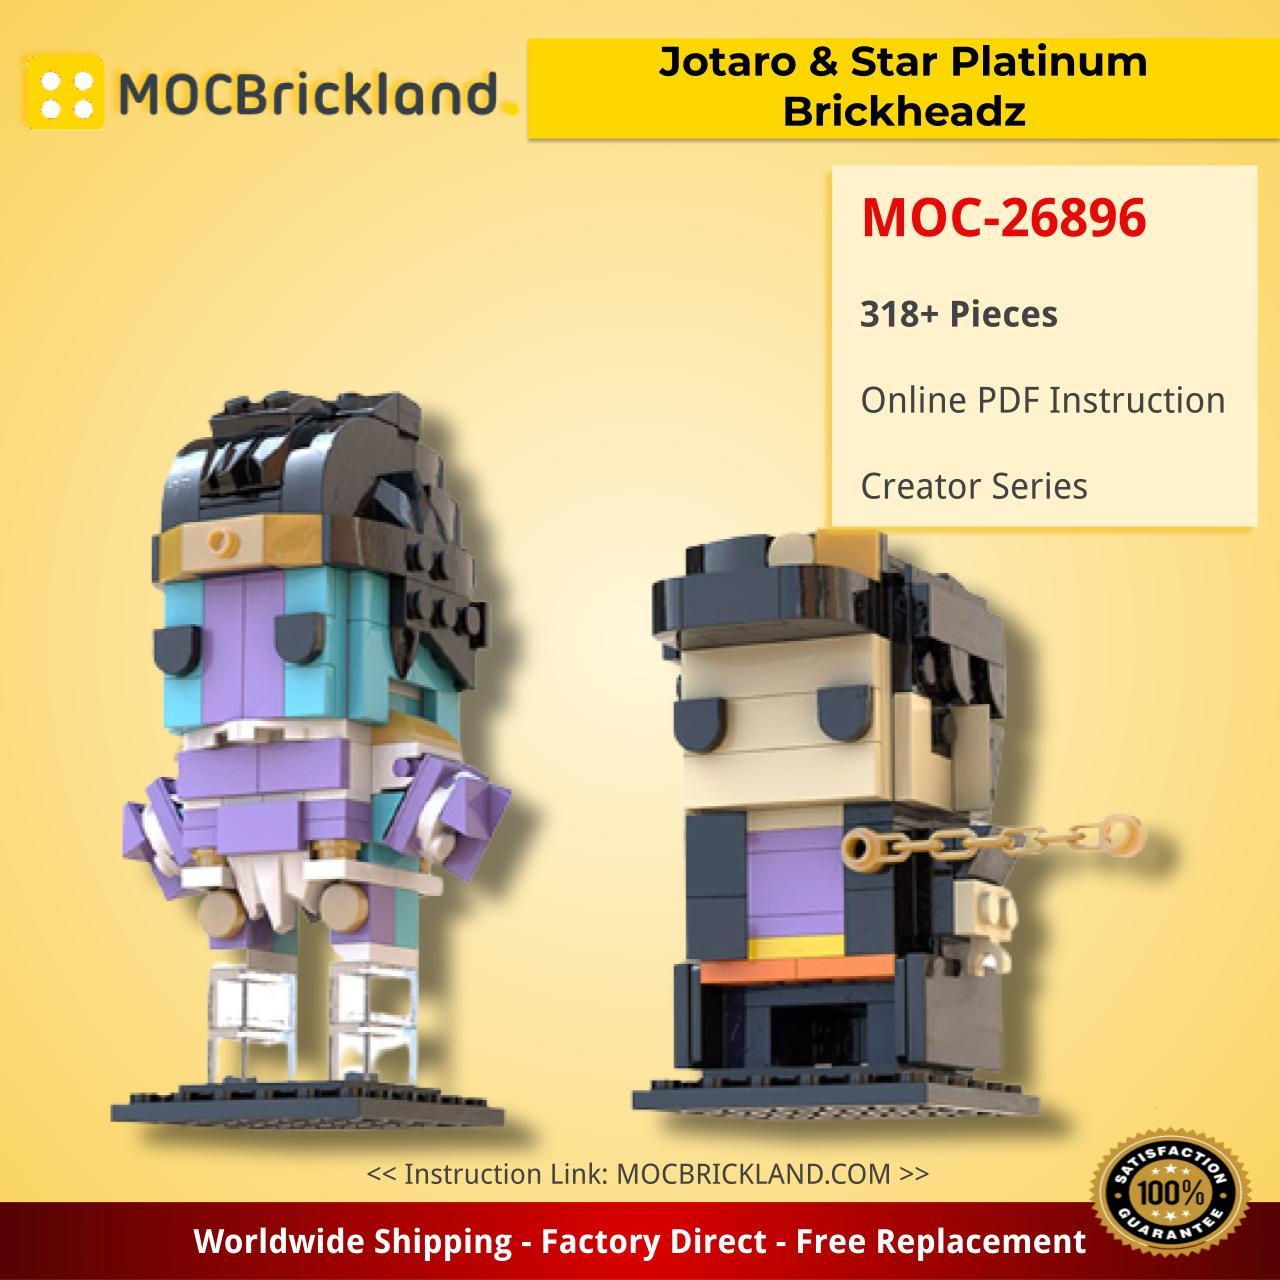 Jotaro & Star Platinum Brickheadz (JoJo's Bizarre Adventure) Creator MOC-26896 by Cryokina WITH 318 PIECES